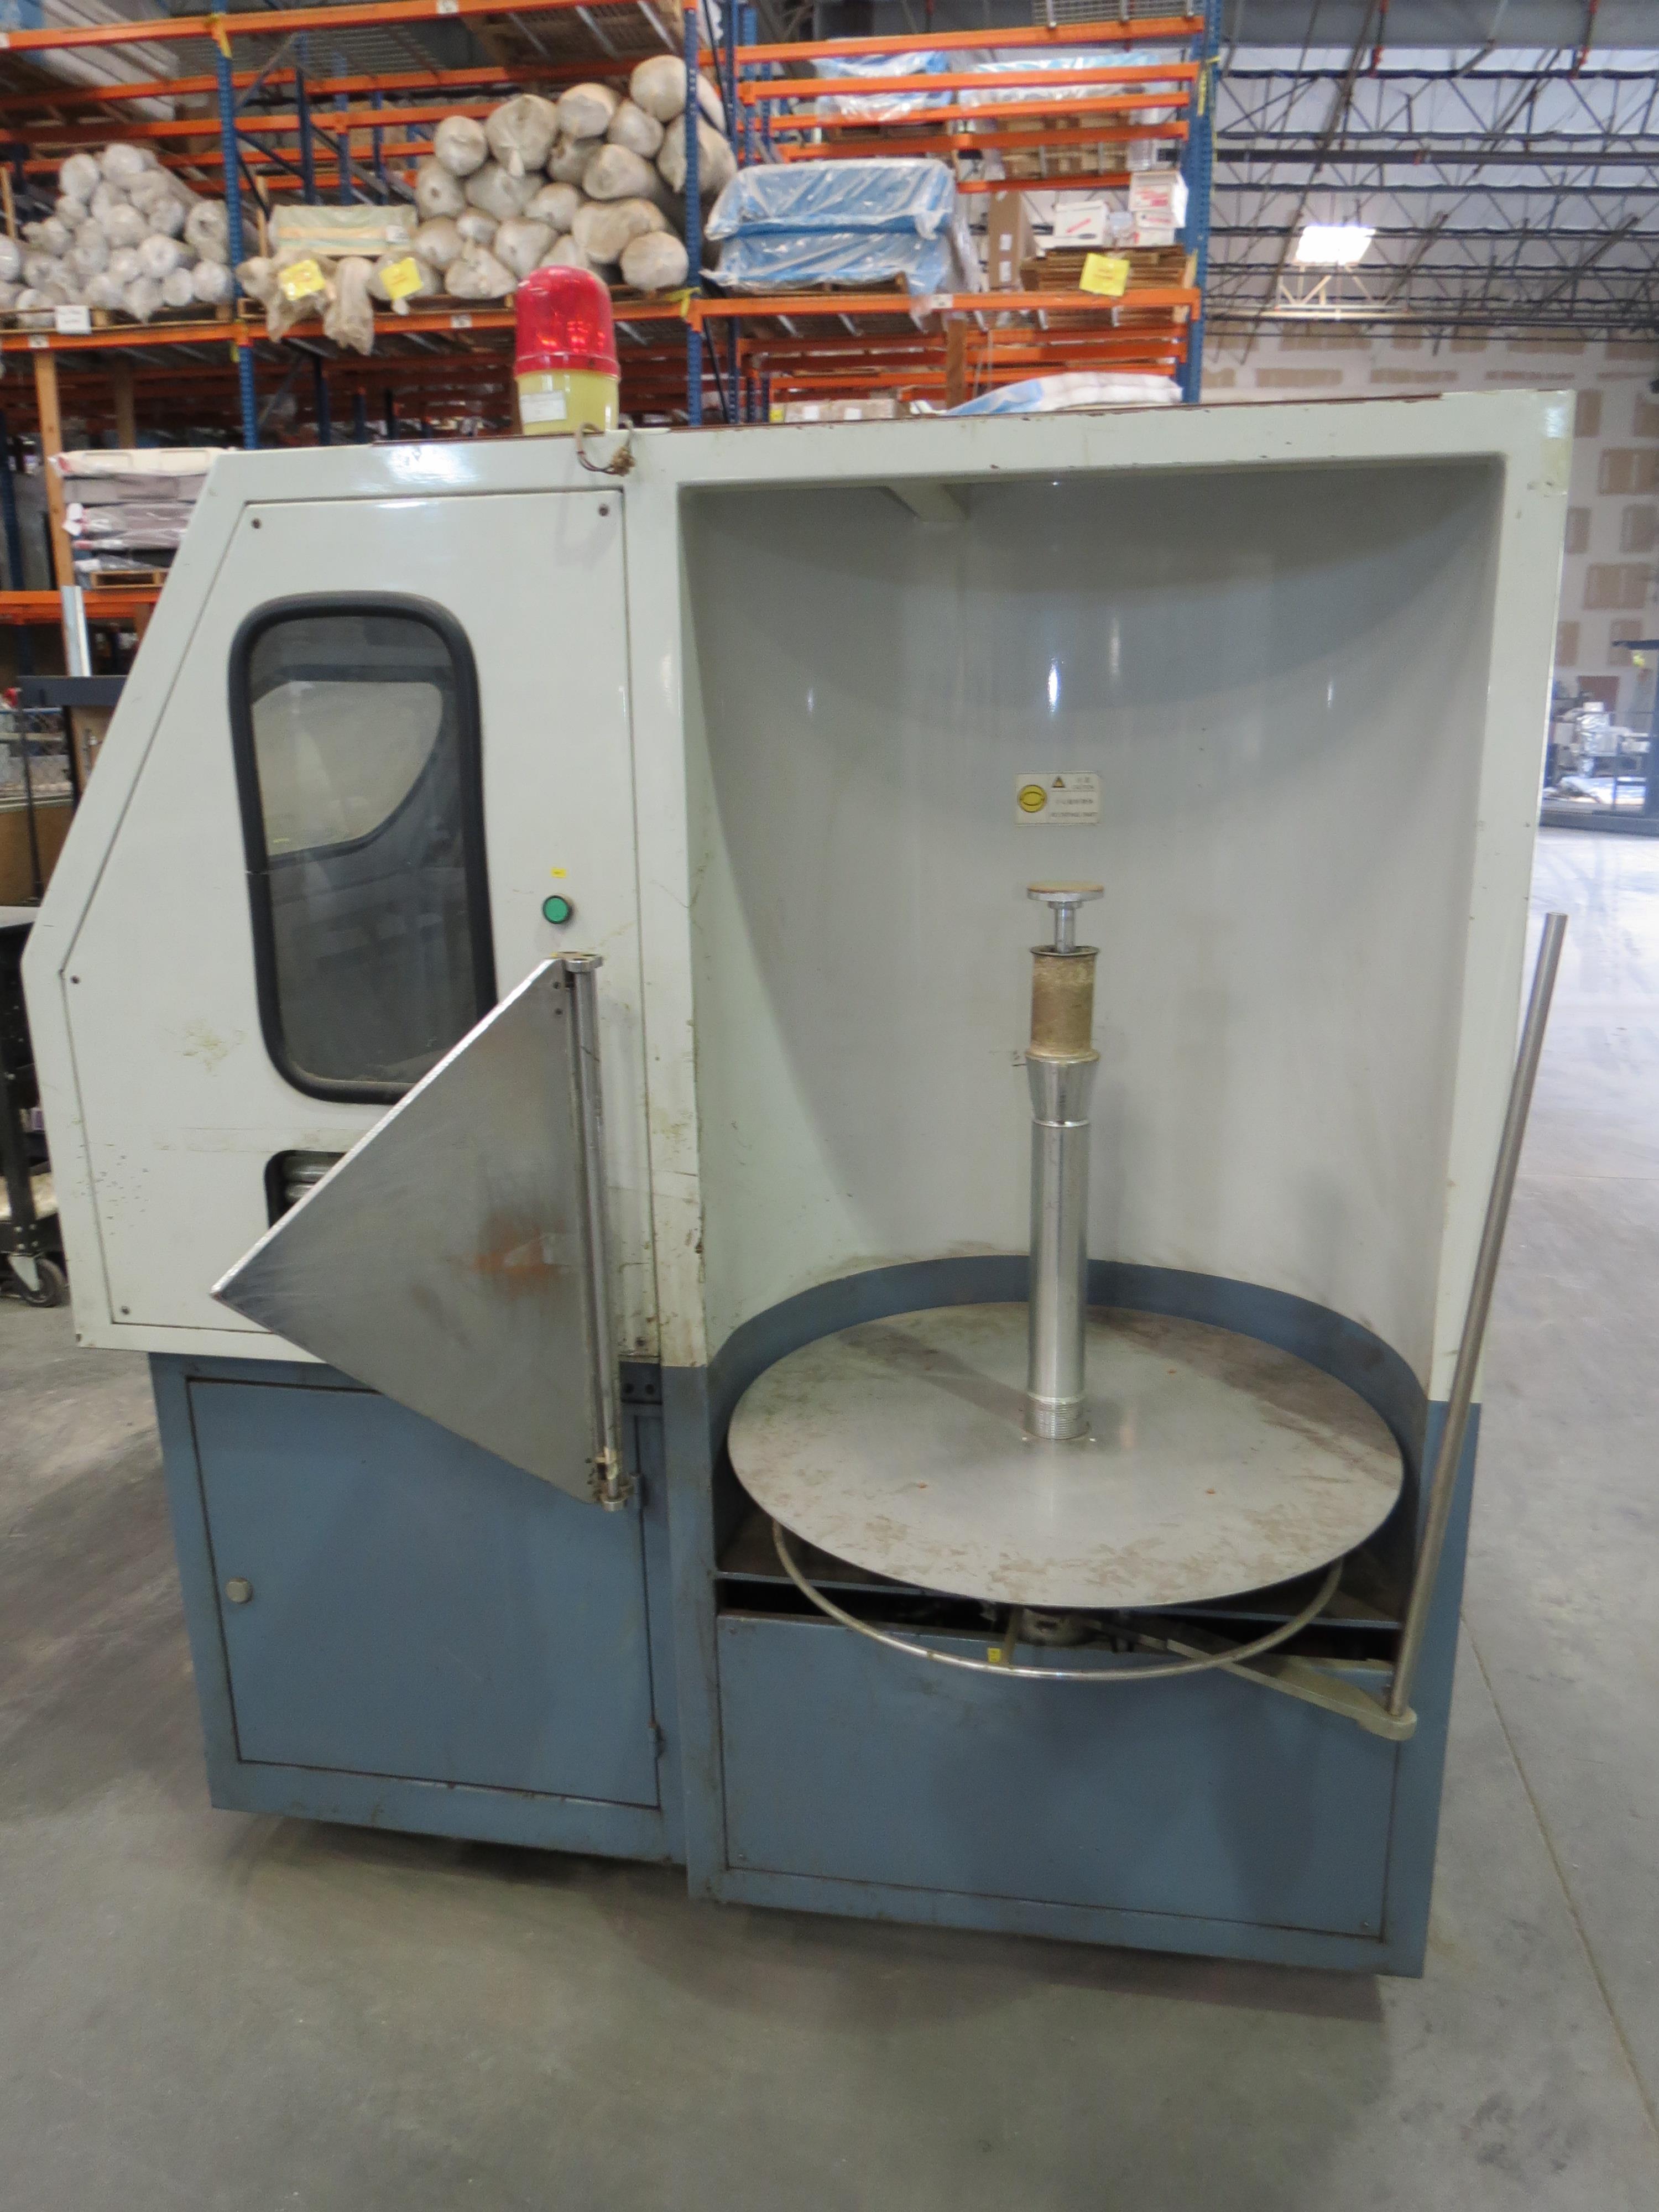 Foshan Yuatian Mattress Machine DZ-6AAutomatic Pocket Spring Machine, 220V, SN:0905005022 - Image 2 of 5